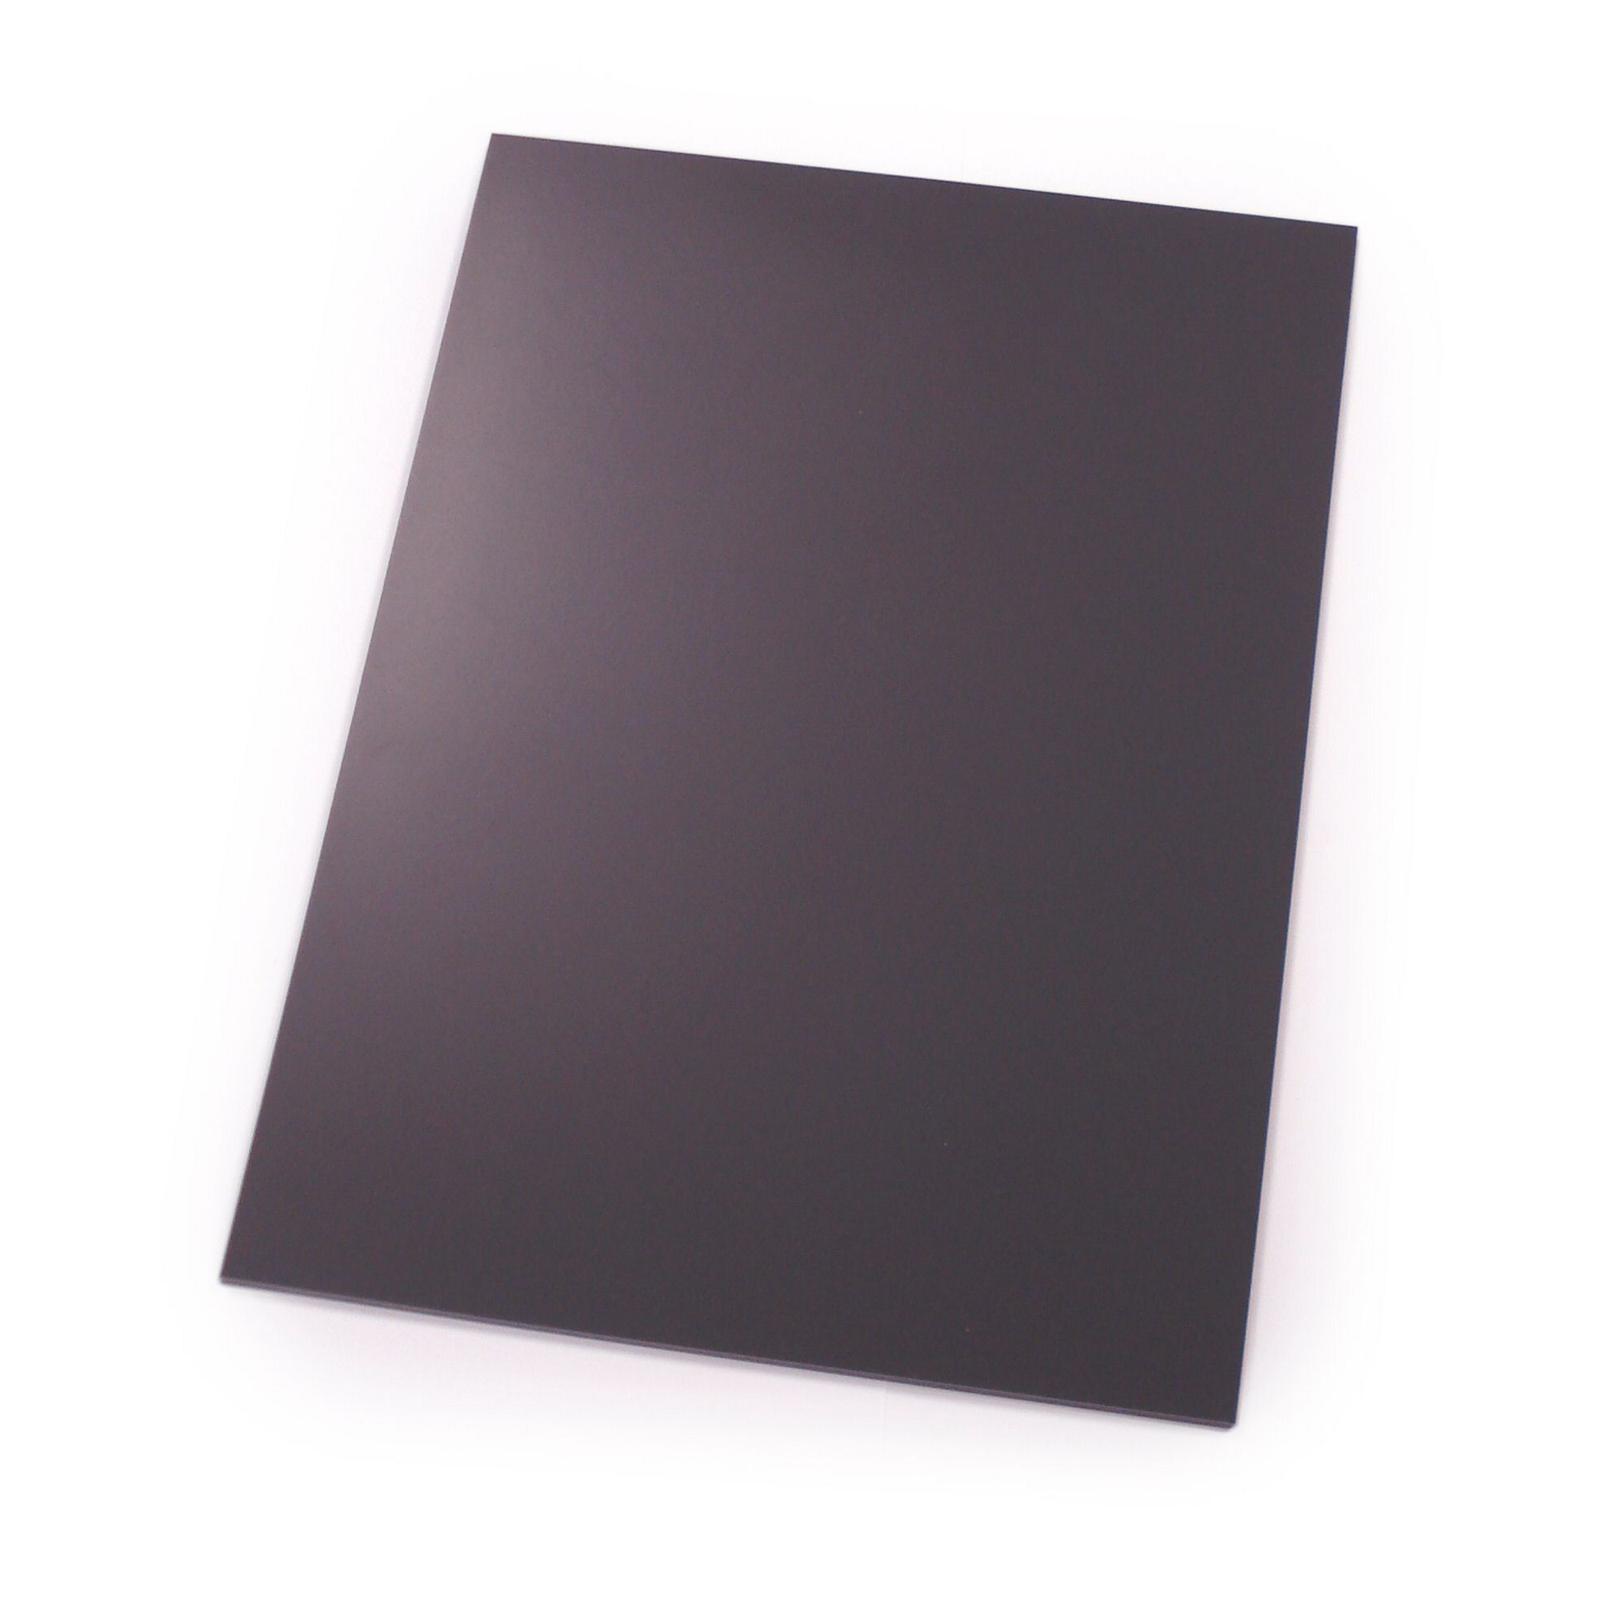 Polymer Blocks for Lino Printing - 203 x 152mm (8 x 6in)